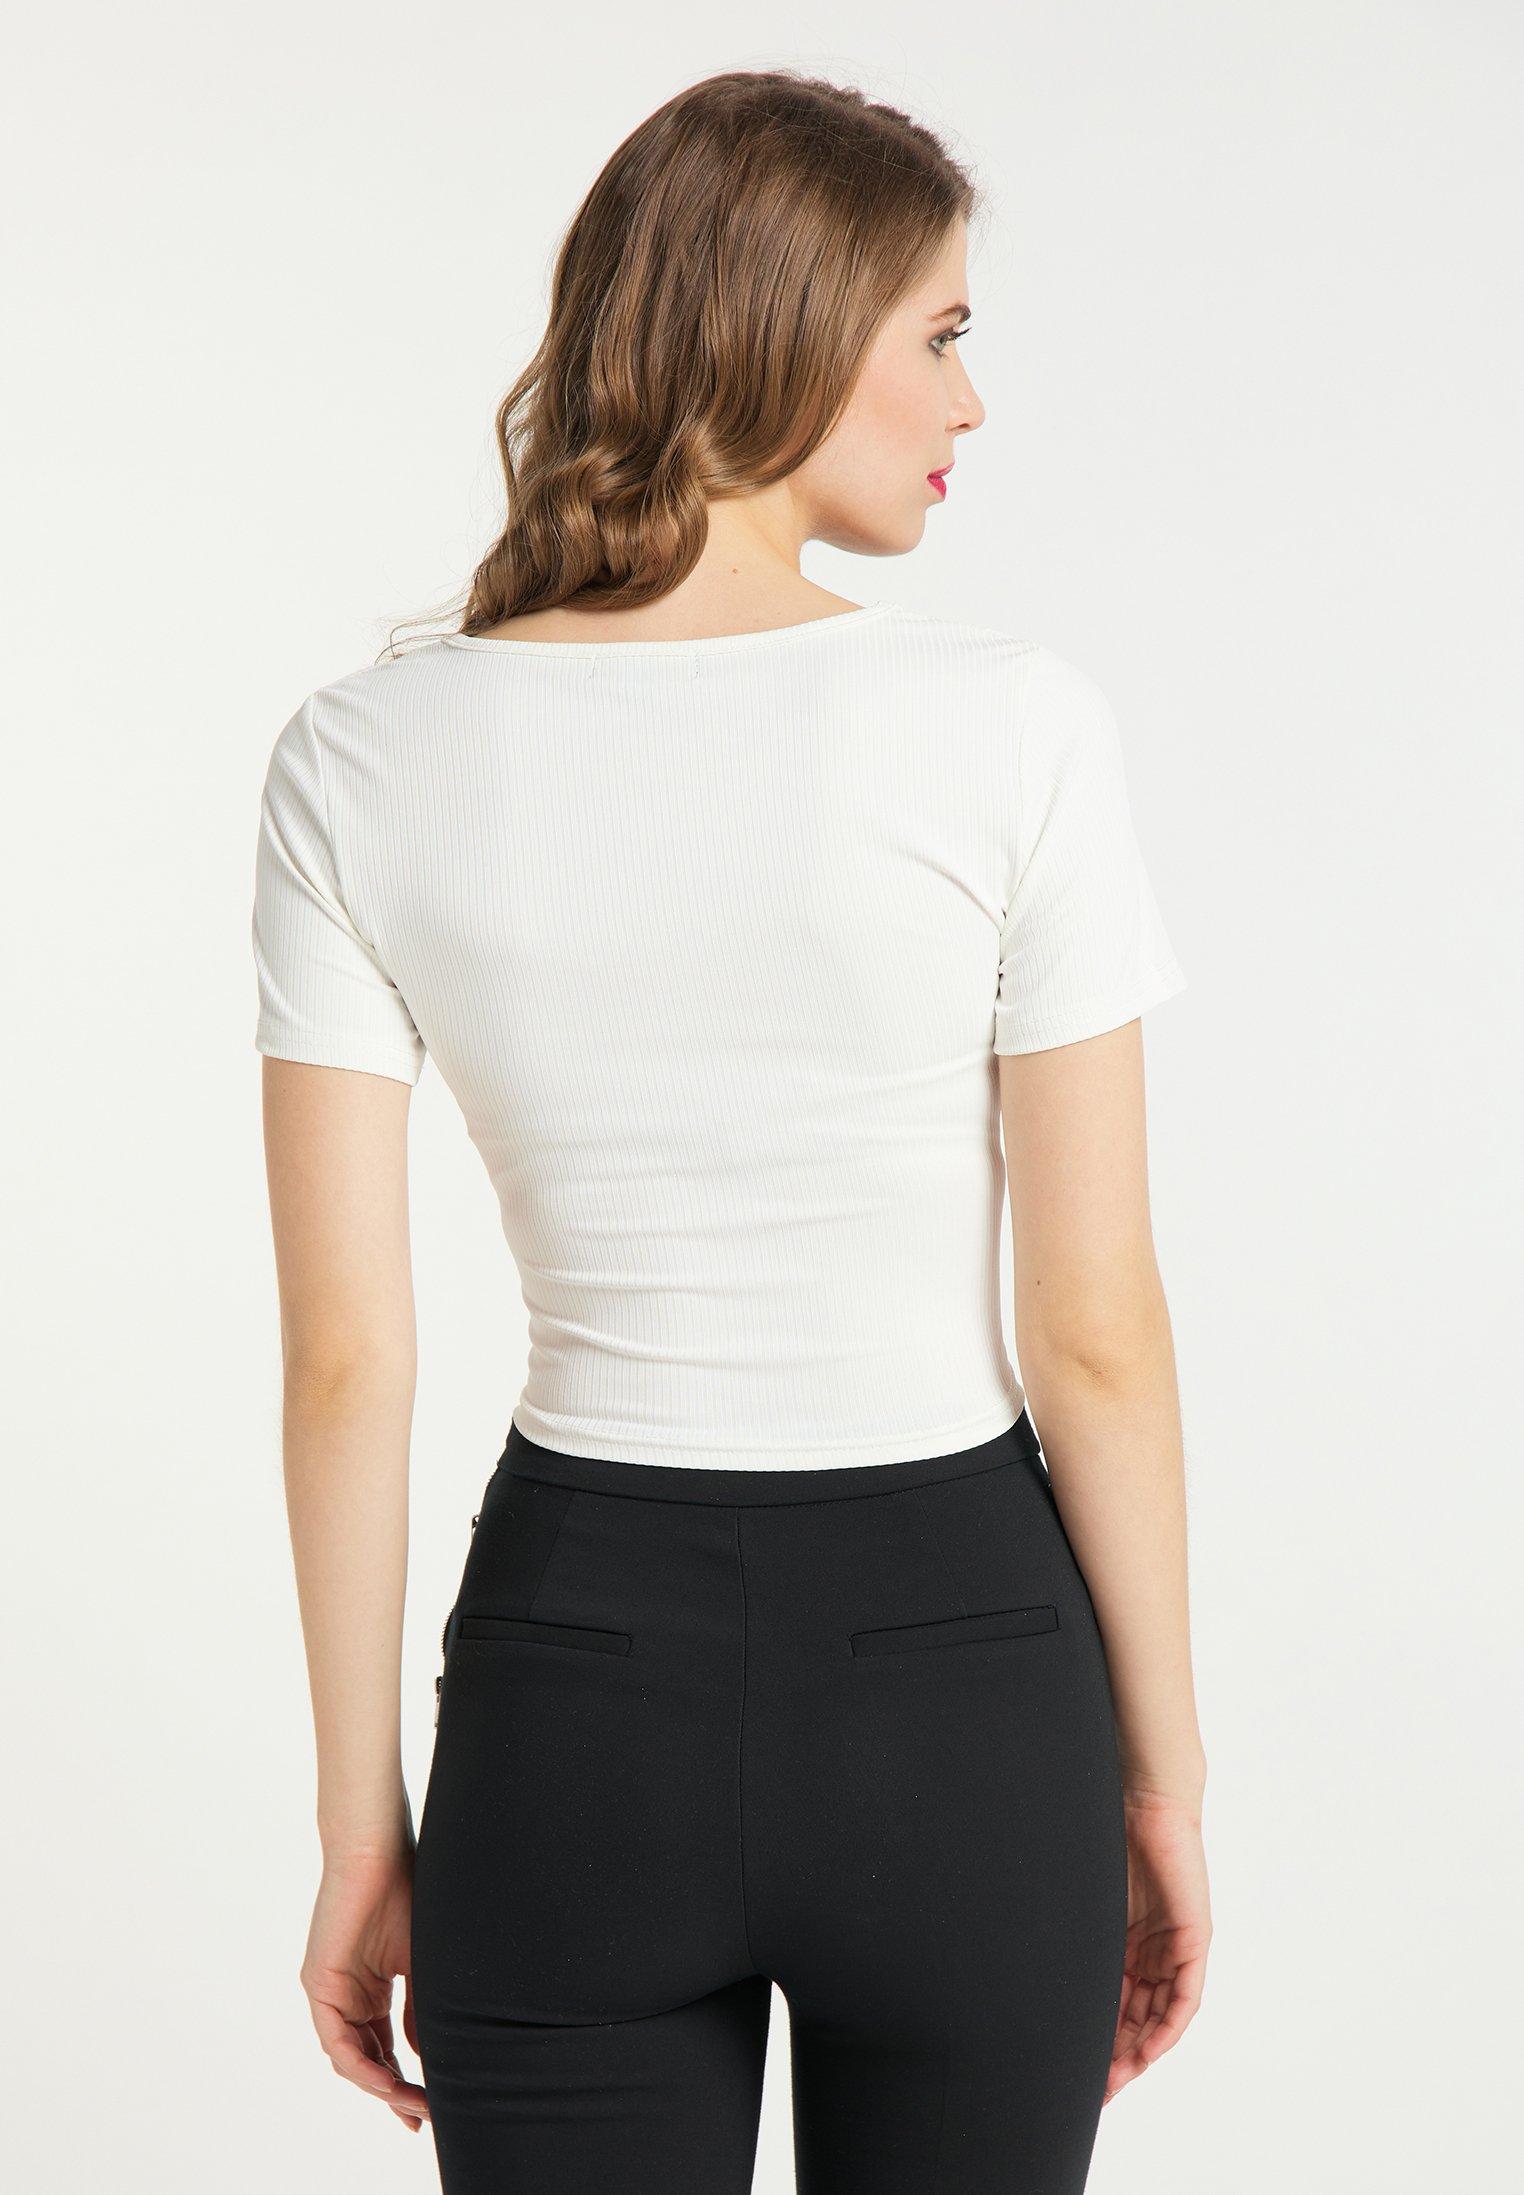 High Quality Women's Clothing faina Print T-shirt weiss WAOCdVH8e